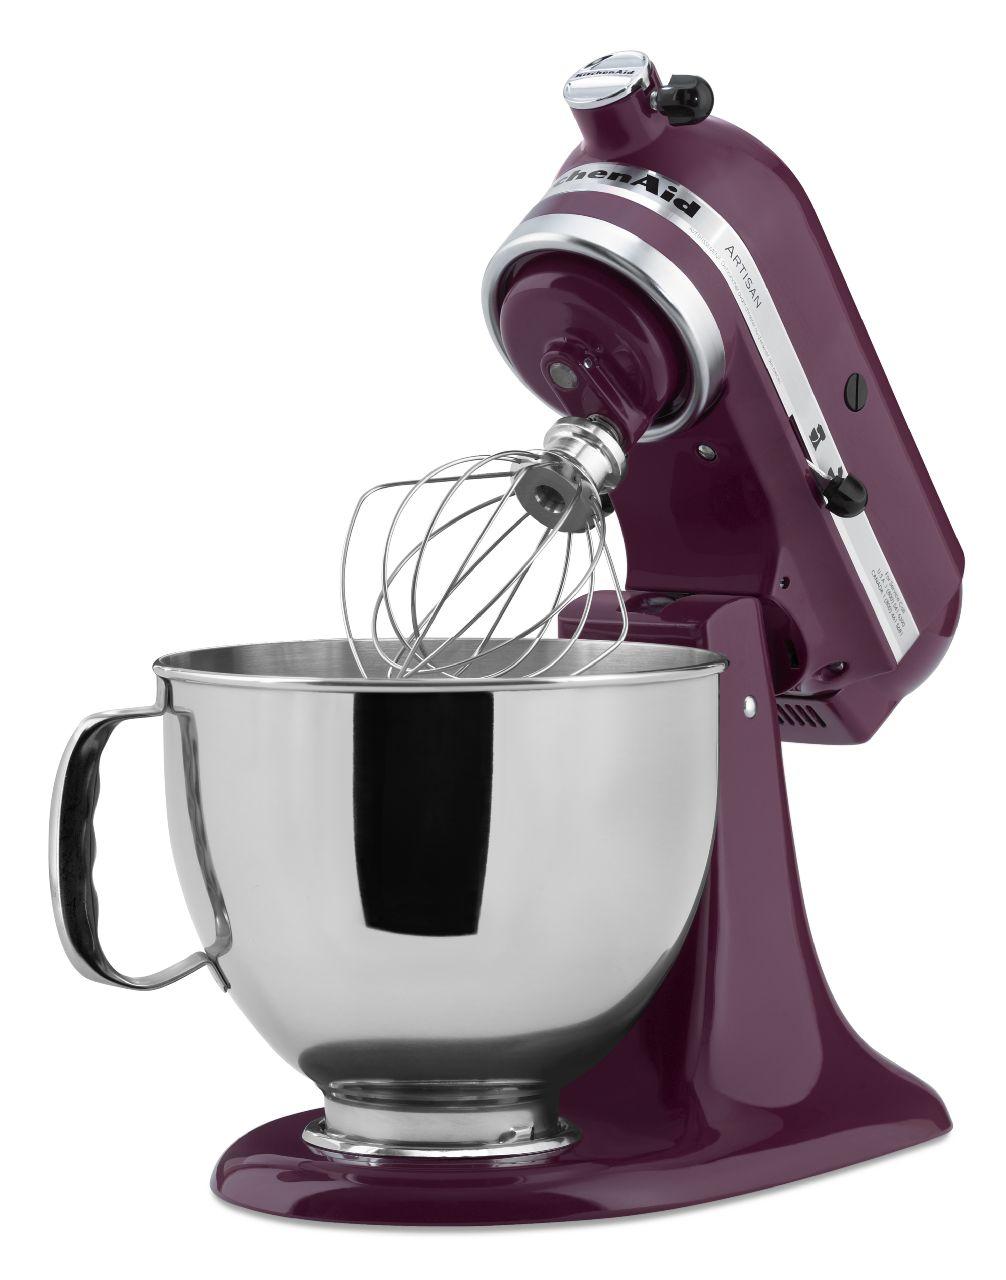 KitchenAid-Artisan-Series-5-Quart-Tilt-Head-Stand-Mixer-10-Speeds-KSM150PS thumbnail 29